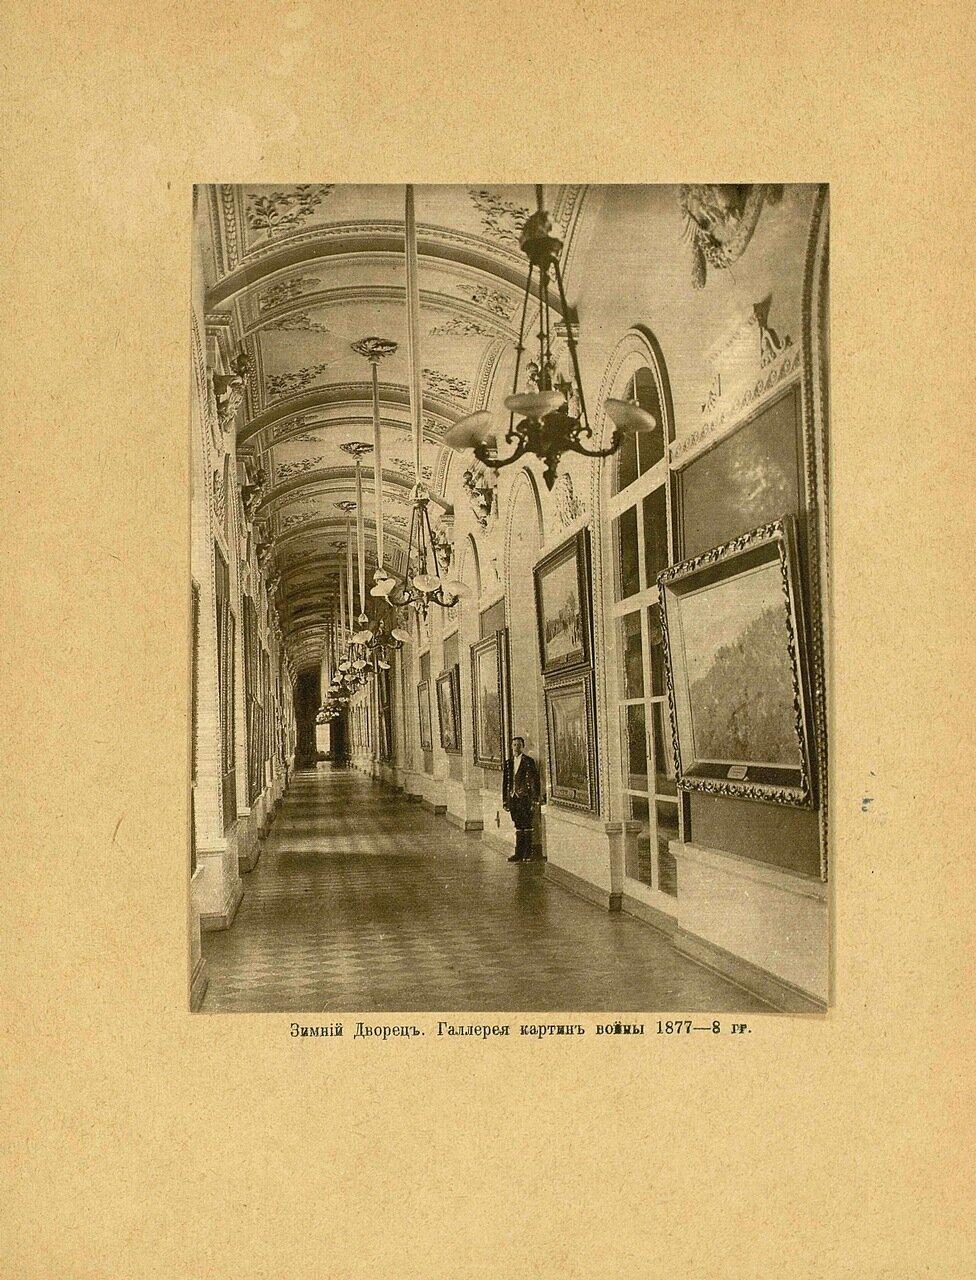 Галерея картин войны 1877-78 гг.